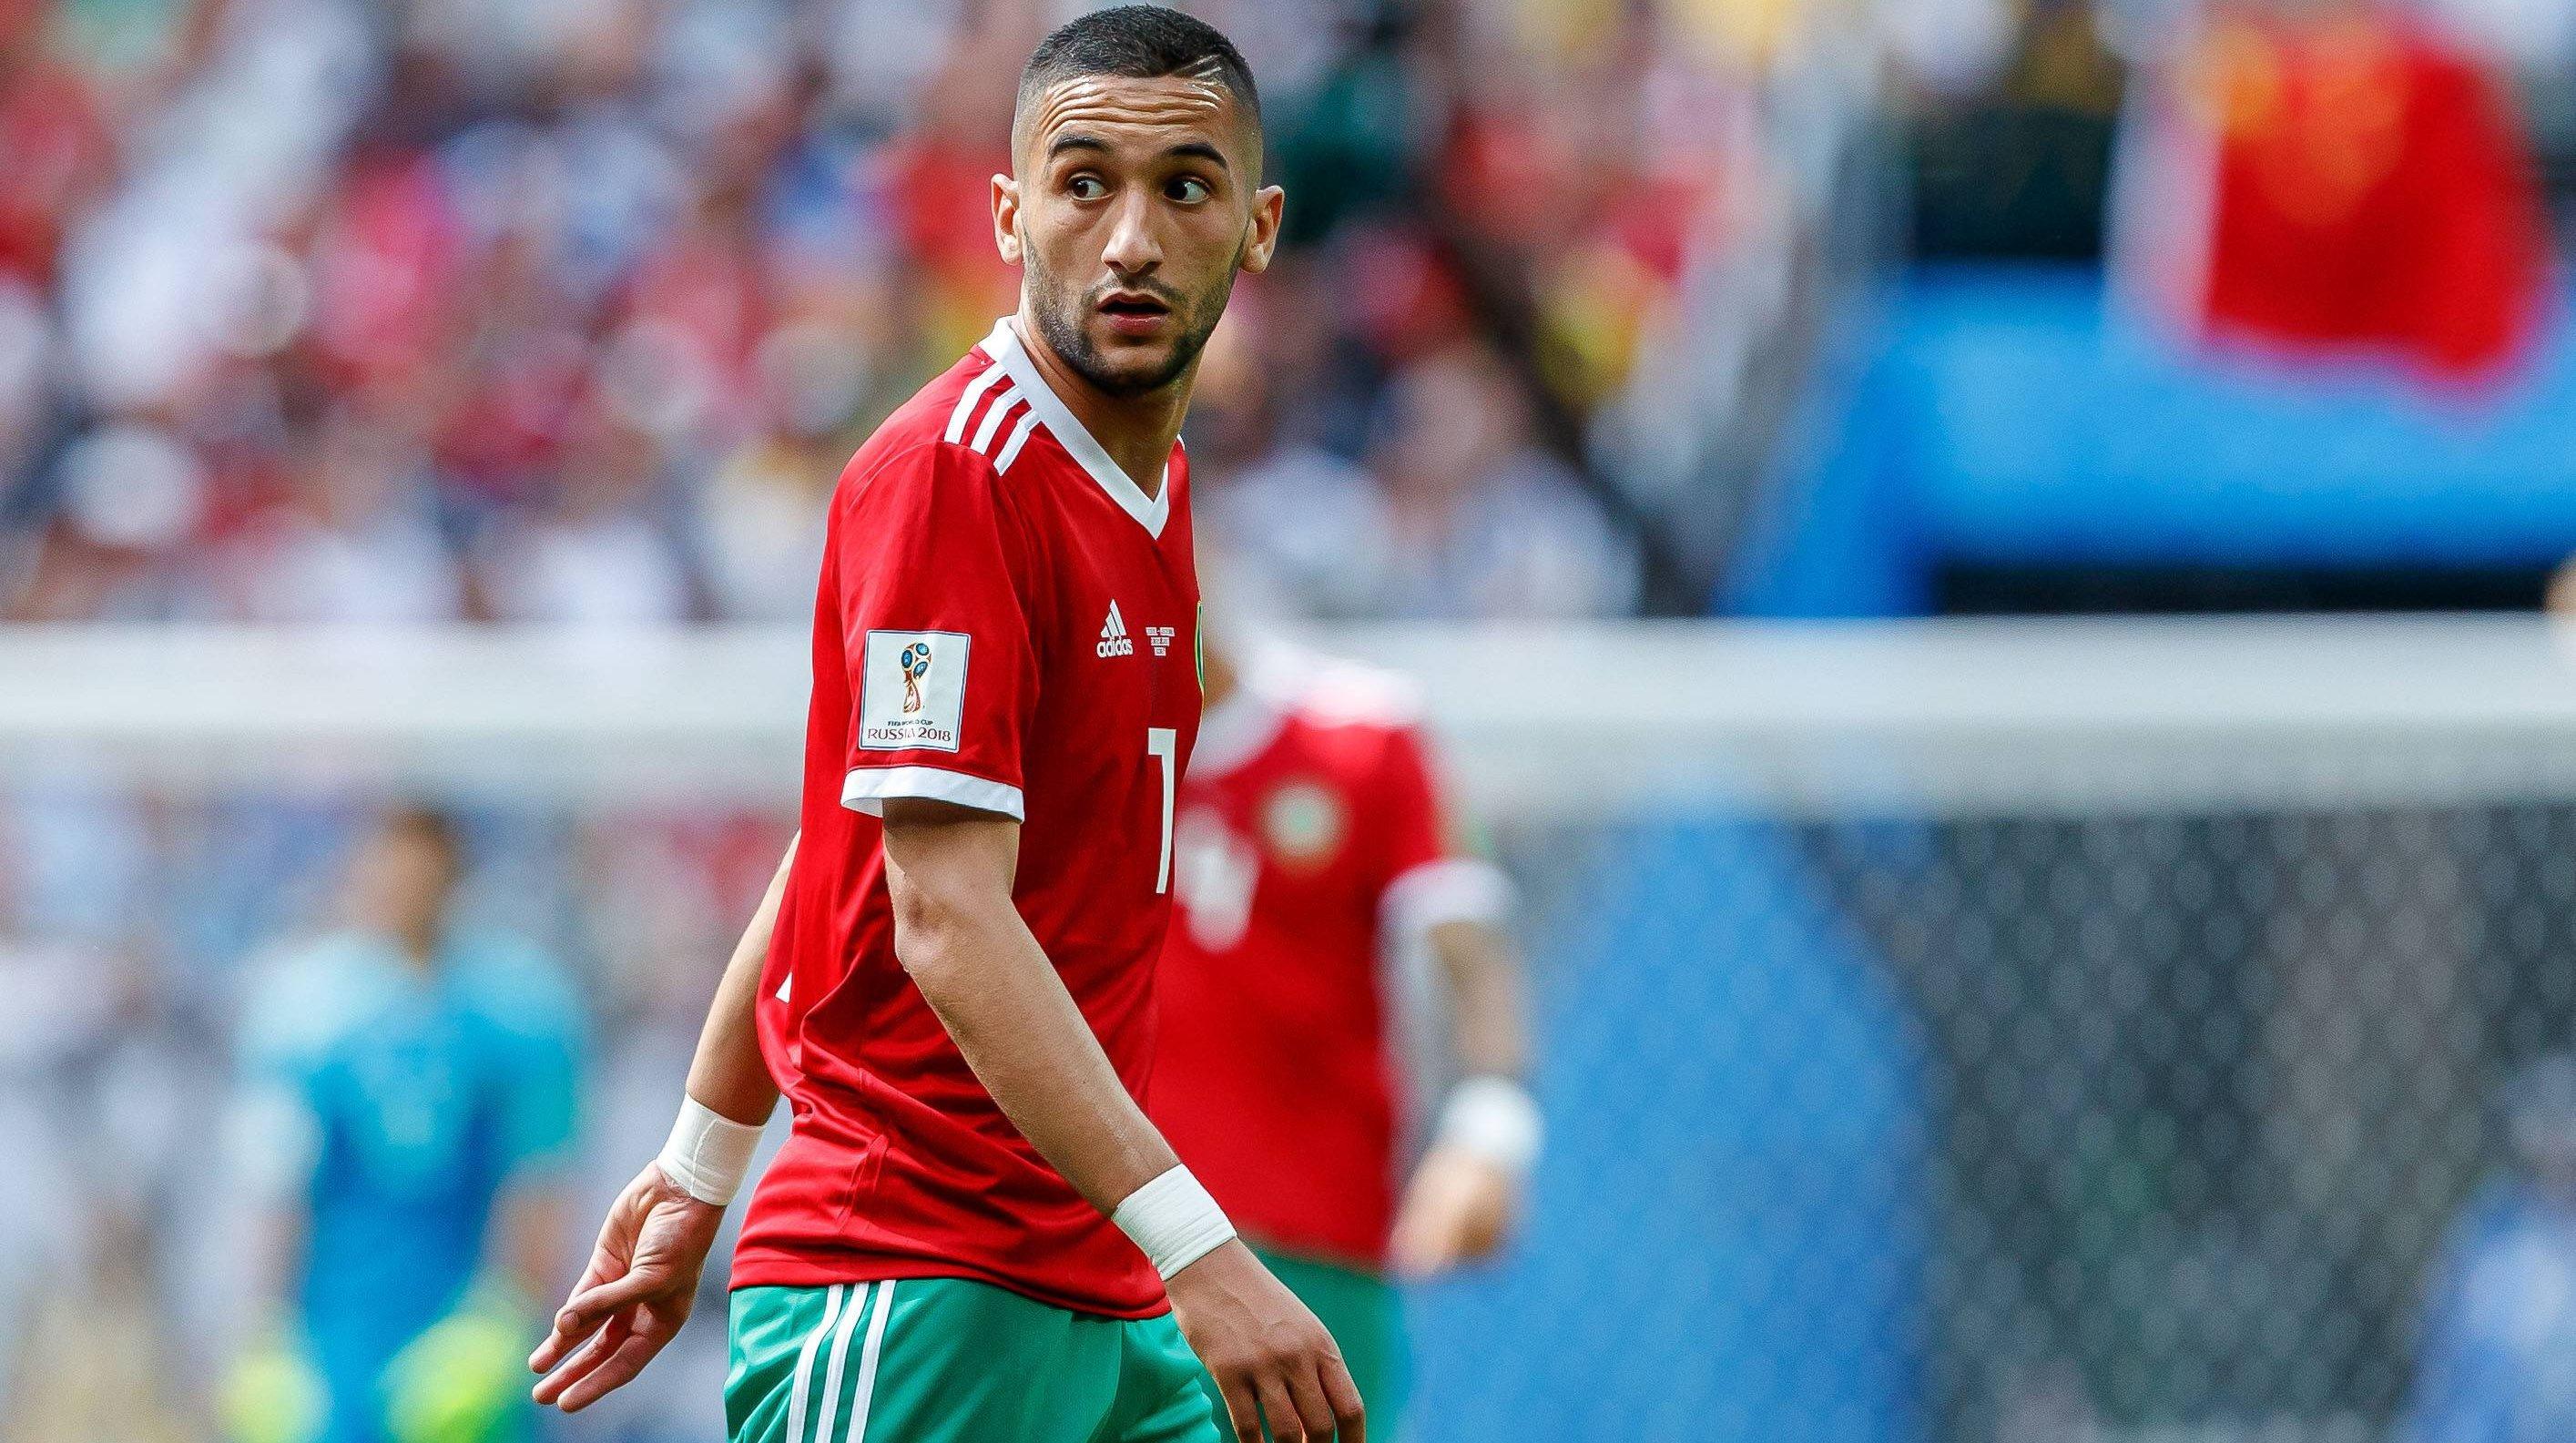 "Marokko-Trainer: Chelseas Ziyech ""behauptet, er sei verletzt, obwohl er  spielen kann"""